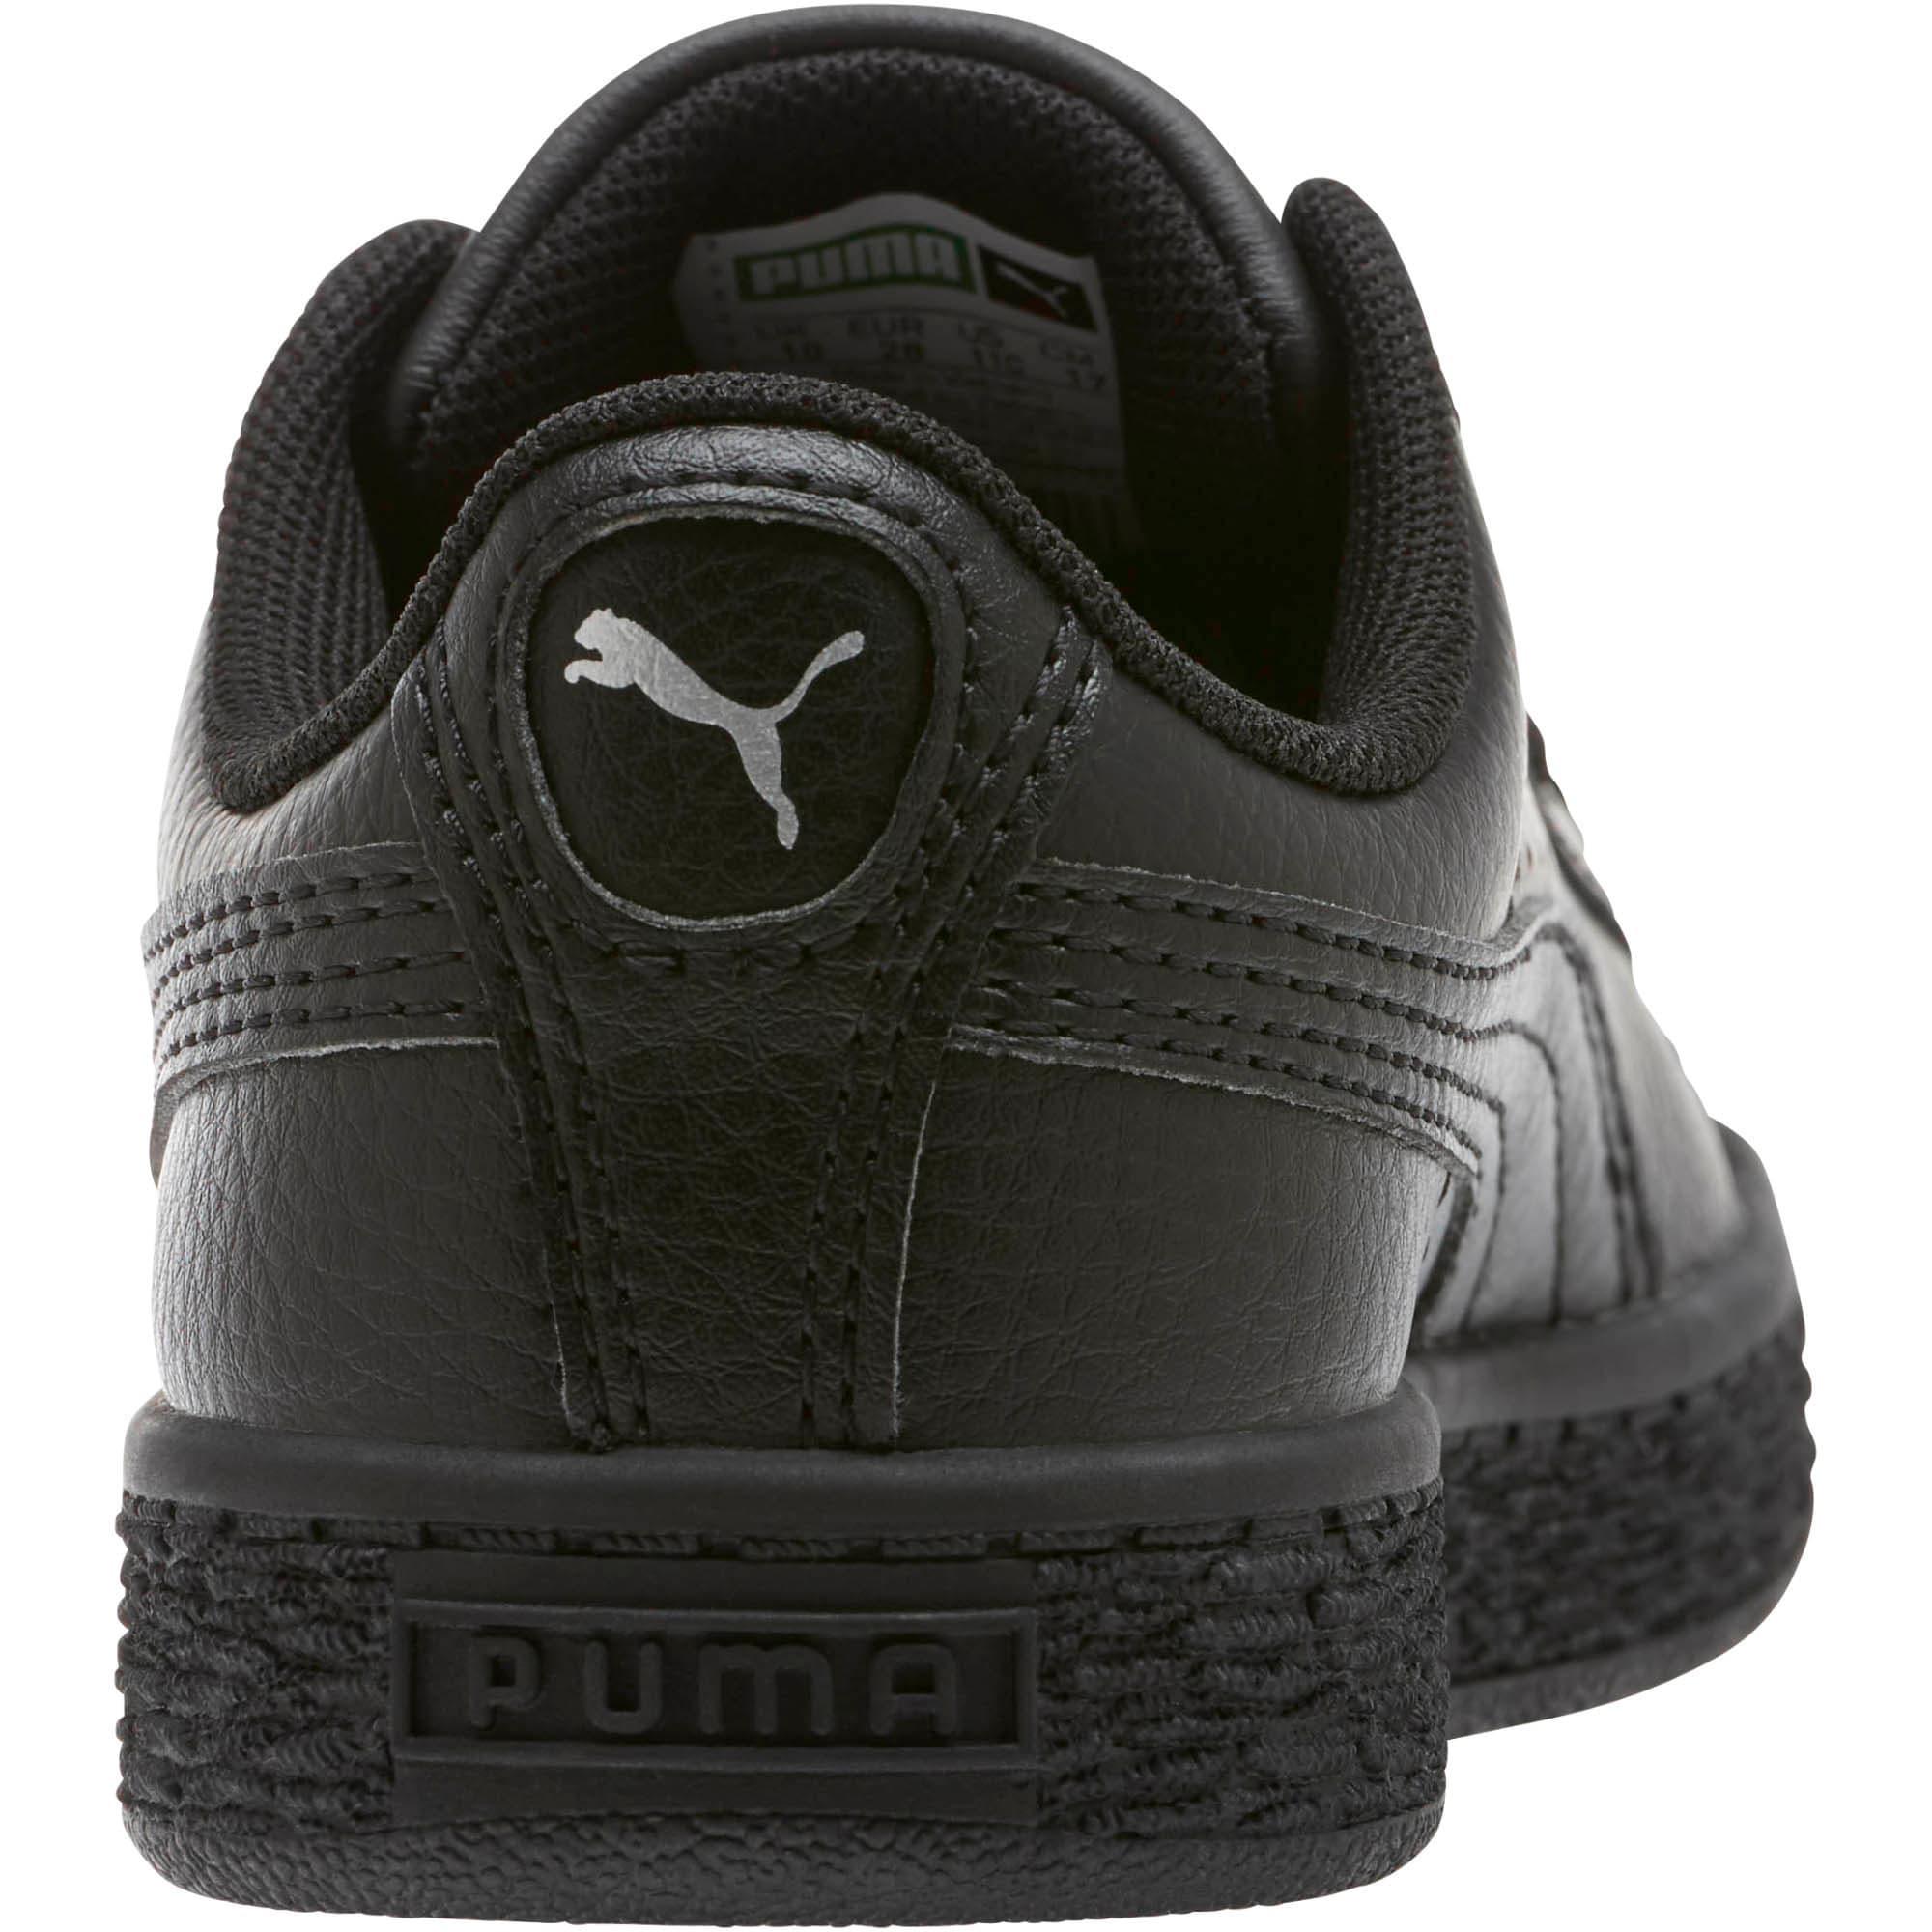 Thumbnail 3 of Basket Classic Little Kids' Shoes, Puma Black-Puma Black, medium